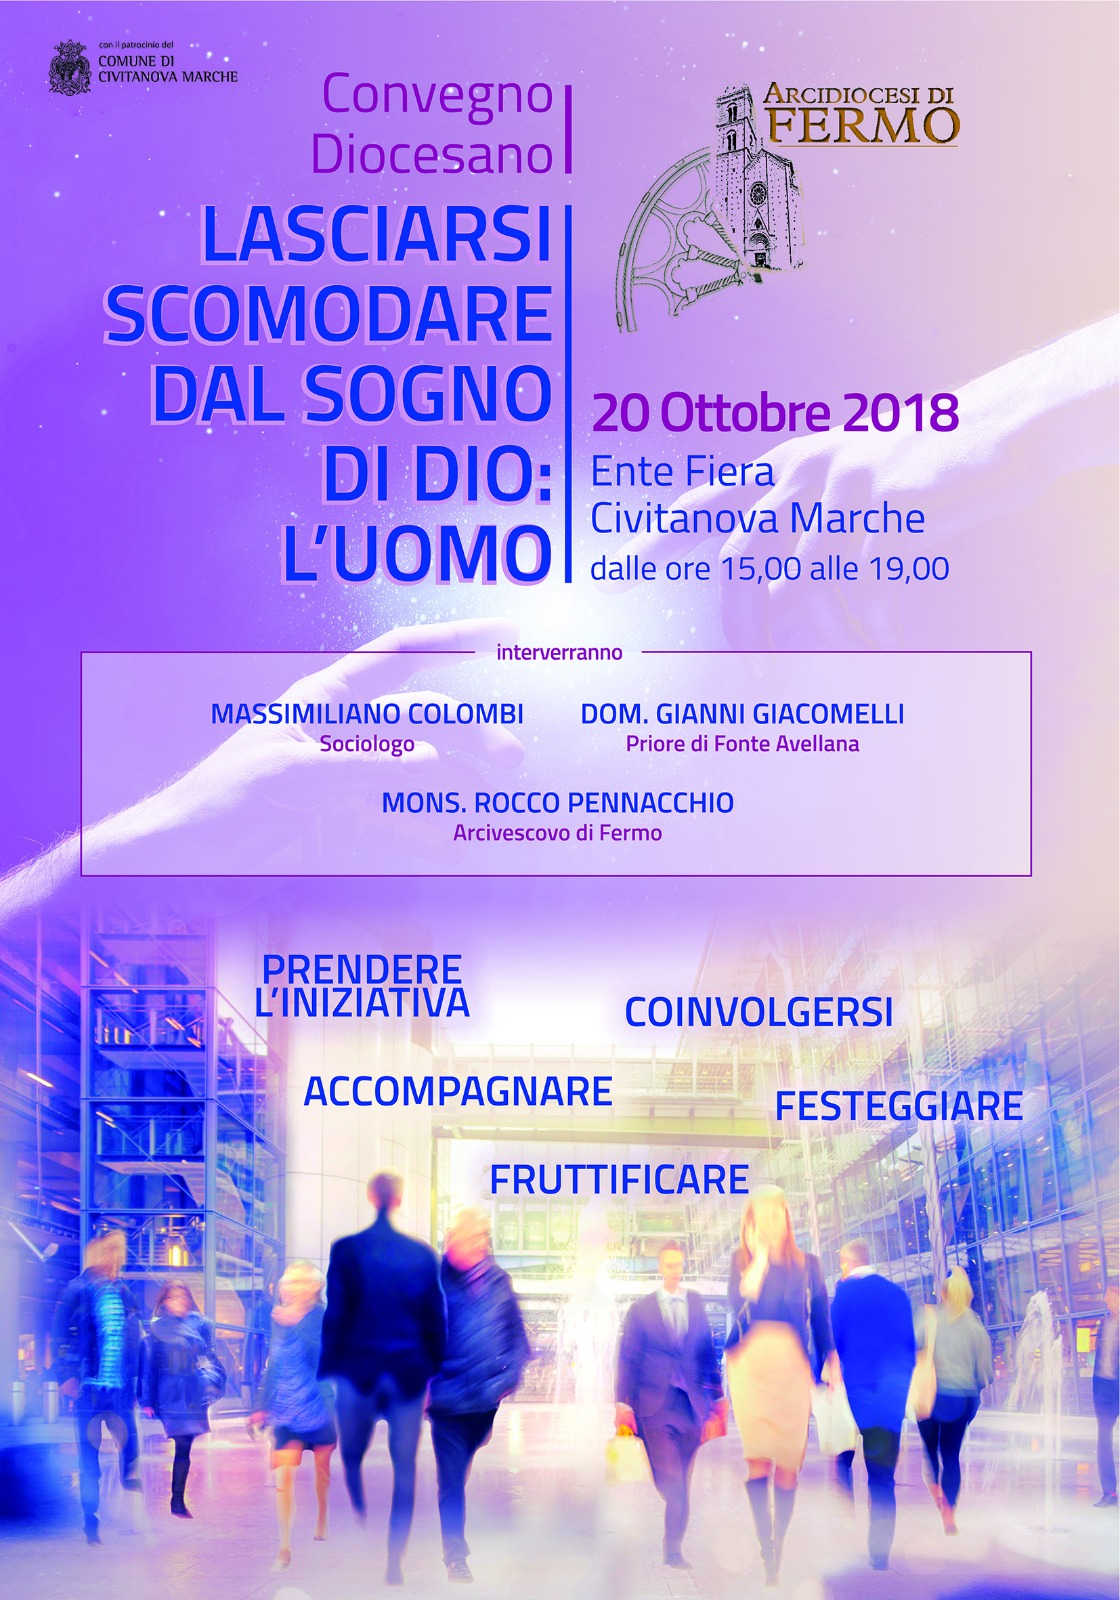 convegno diocesano ente fiera 20 ottobre 2018.jpg